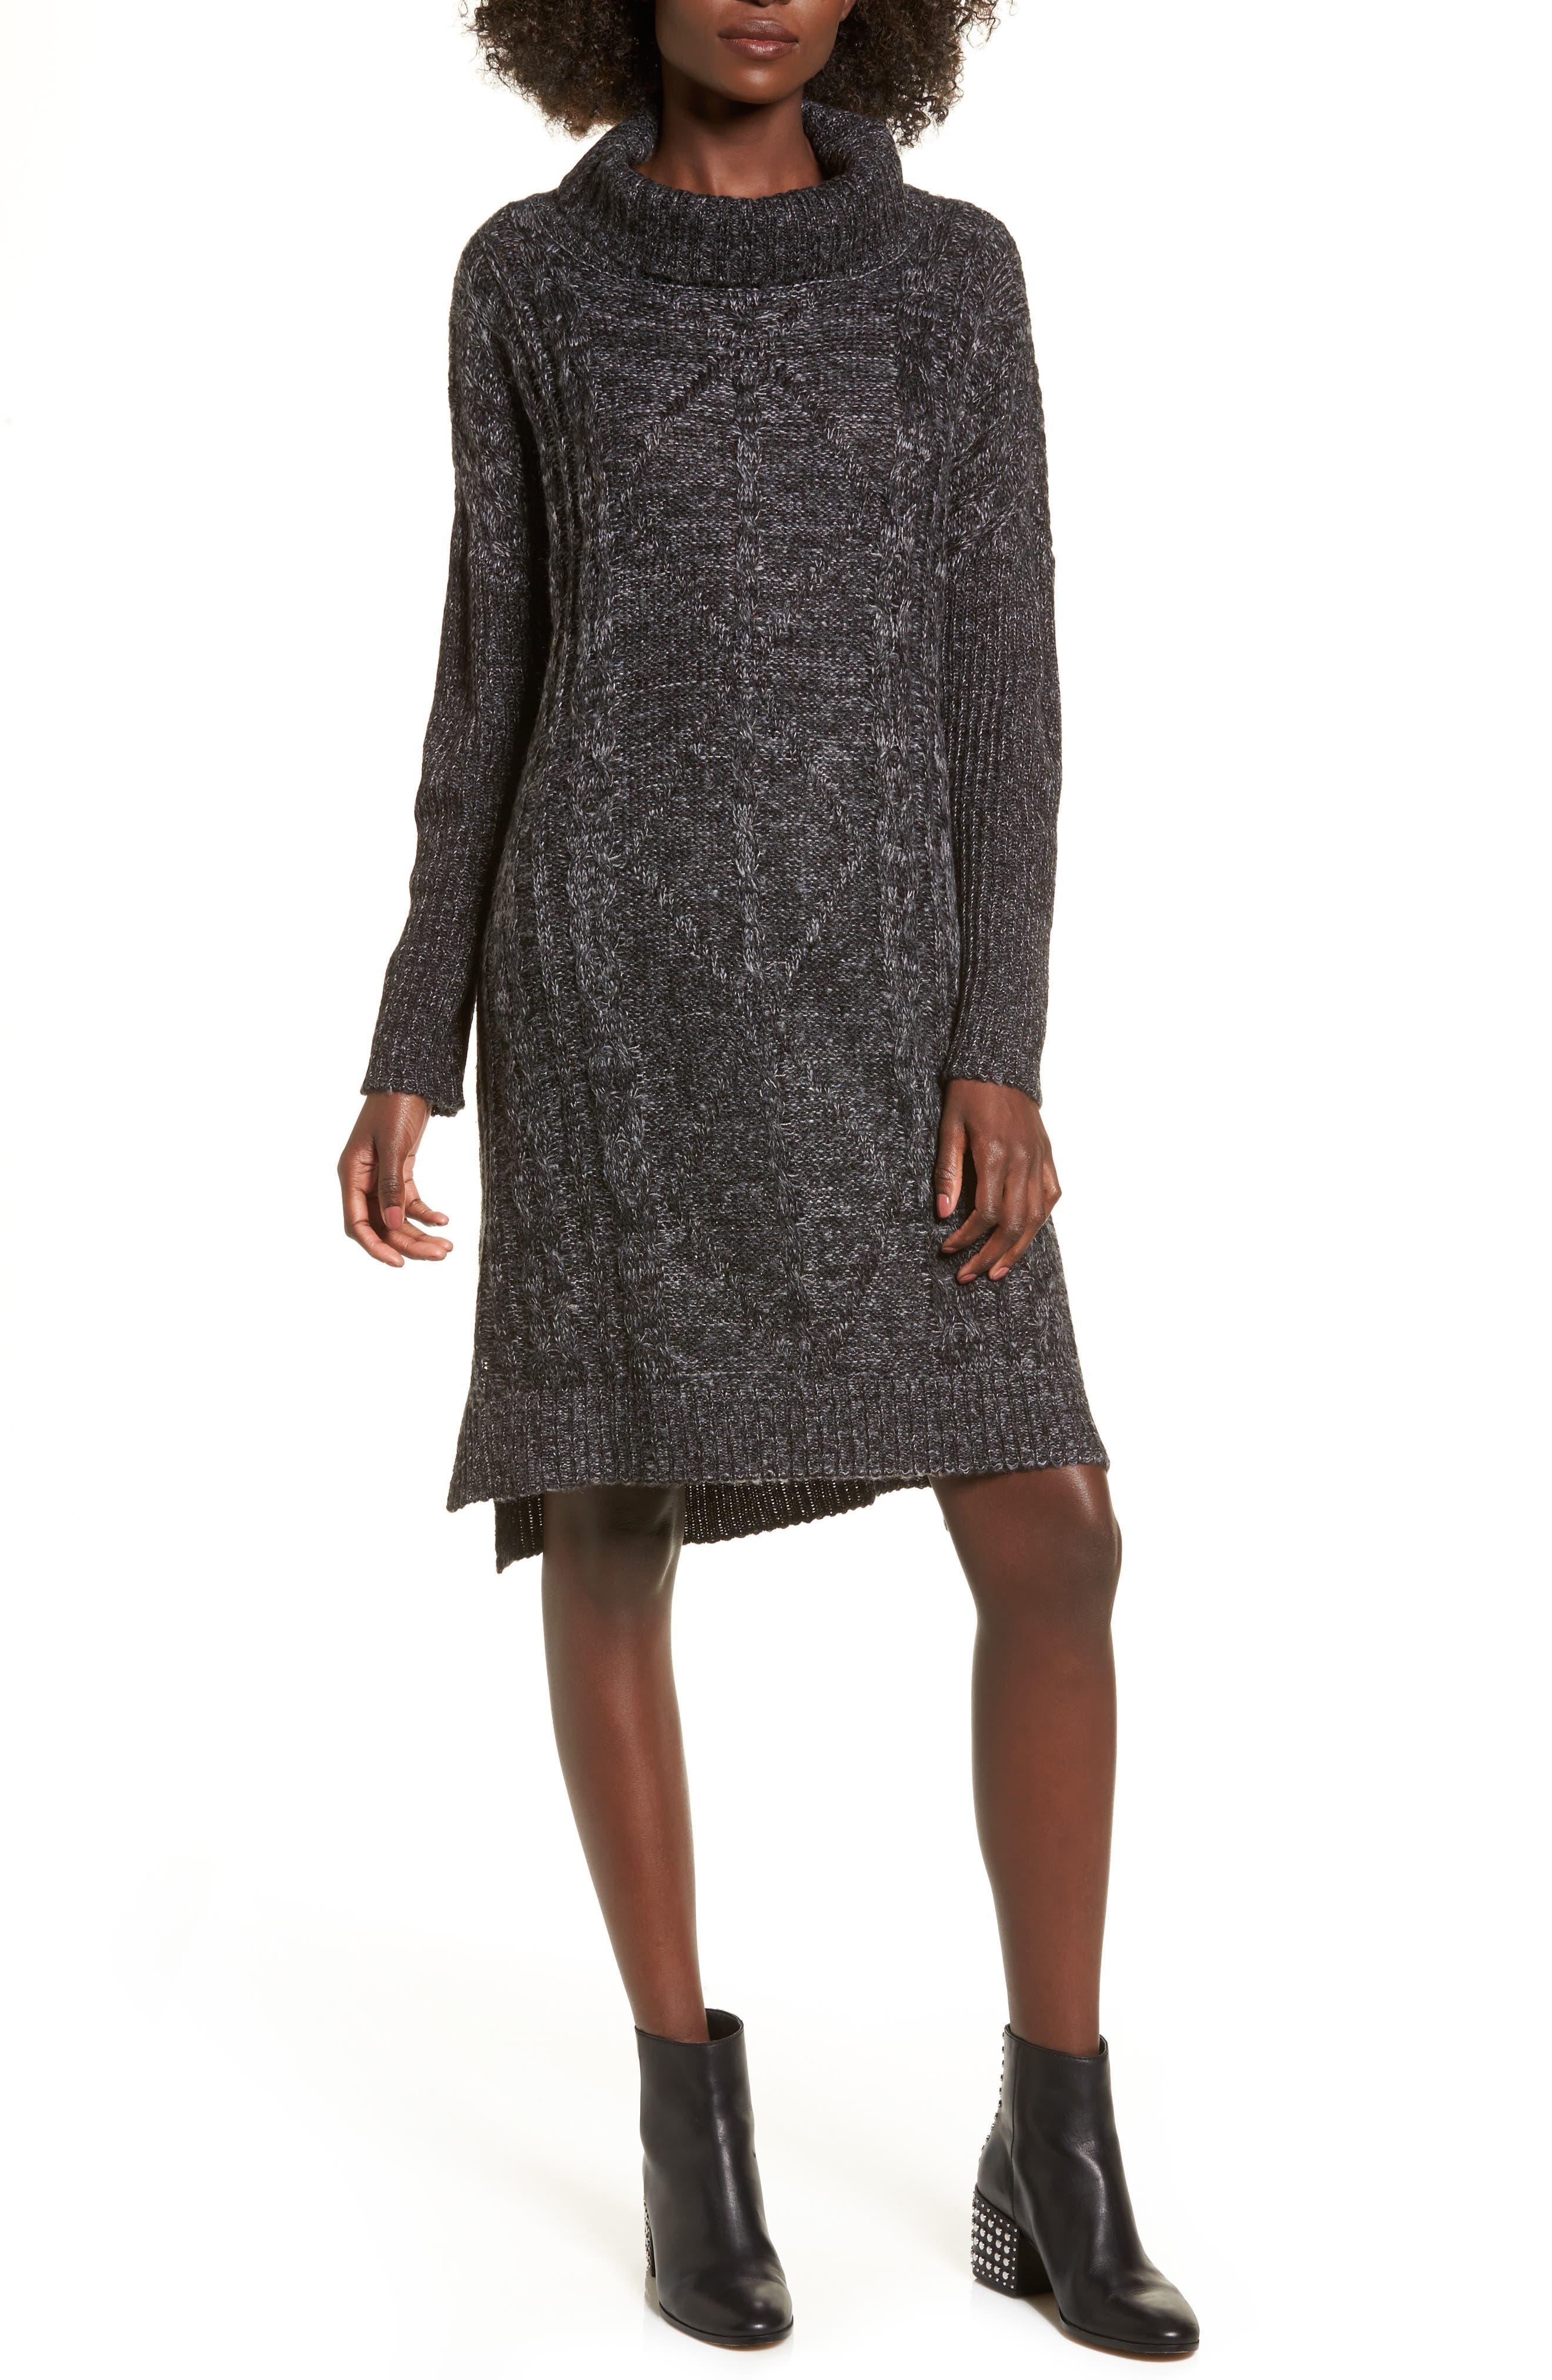 Alternate Image 1 Selected - Cotton Emporium Chunky Turtleneck Sweater Dress